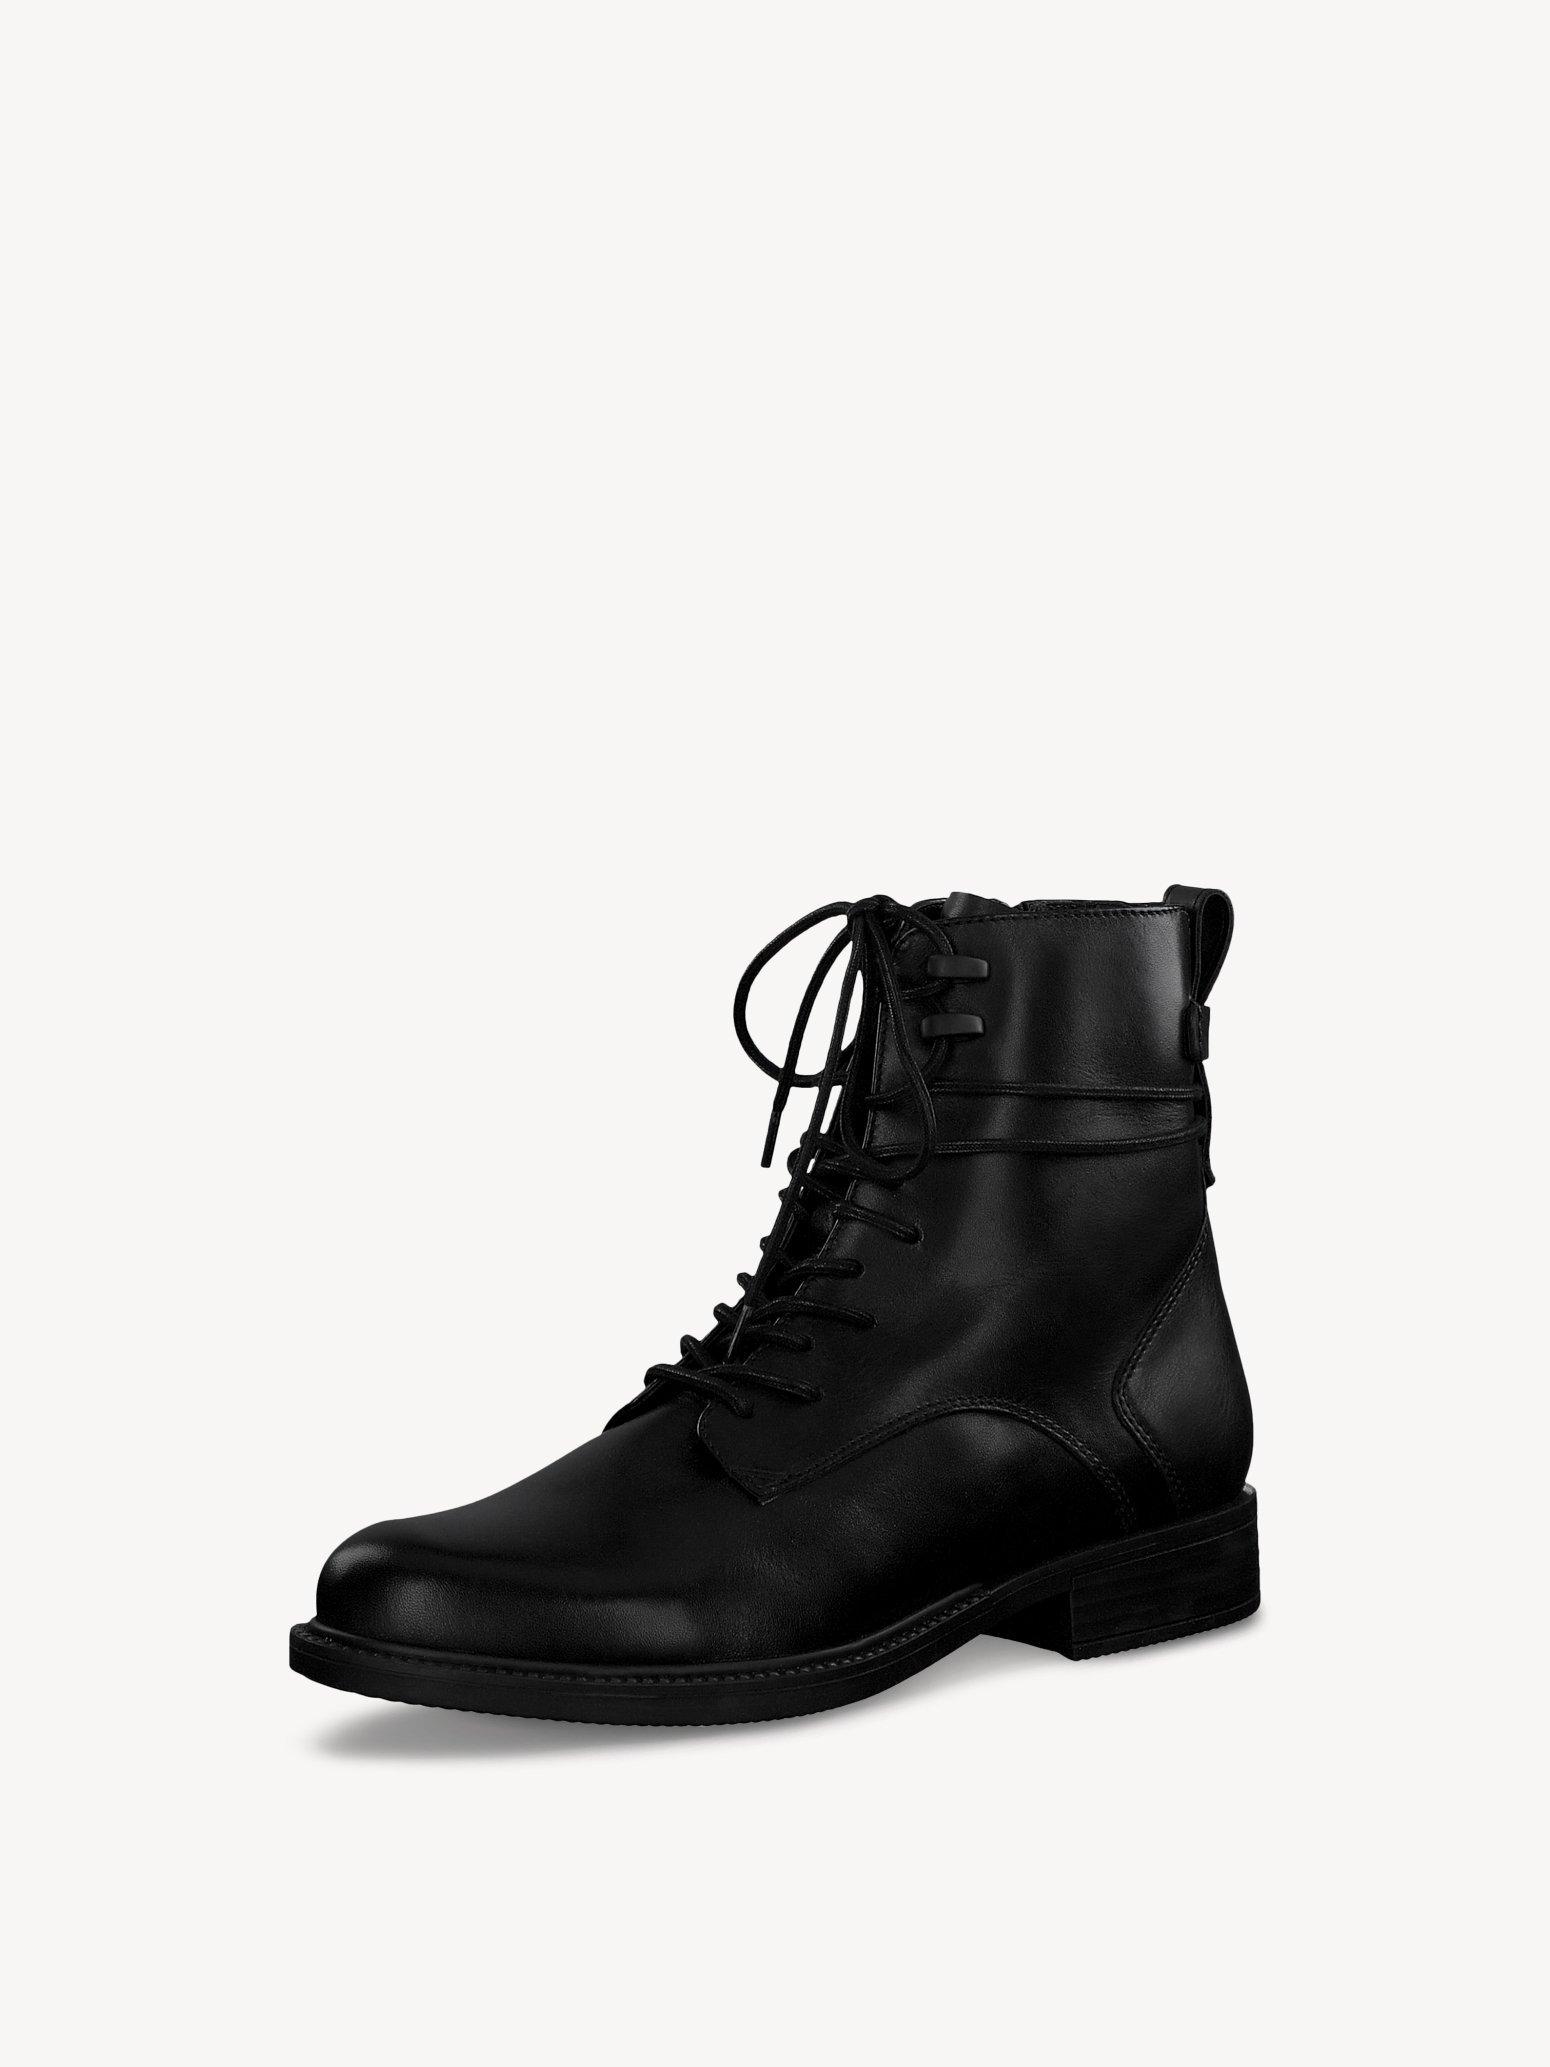 Ботинки Tamaris 1-1-26243-25-001